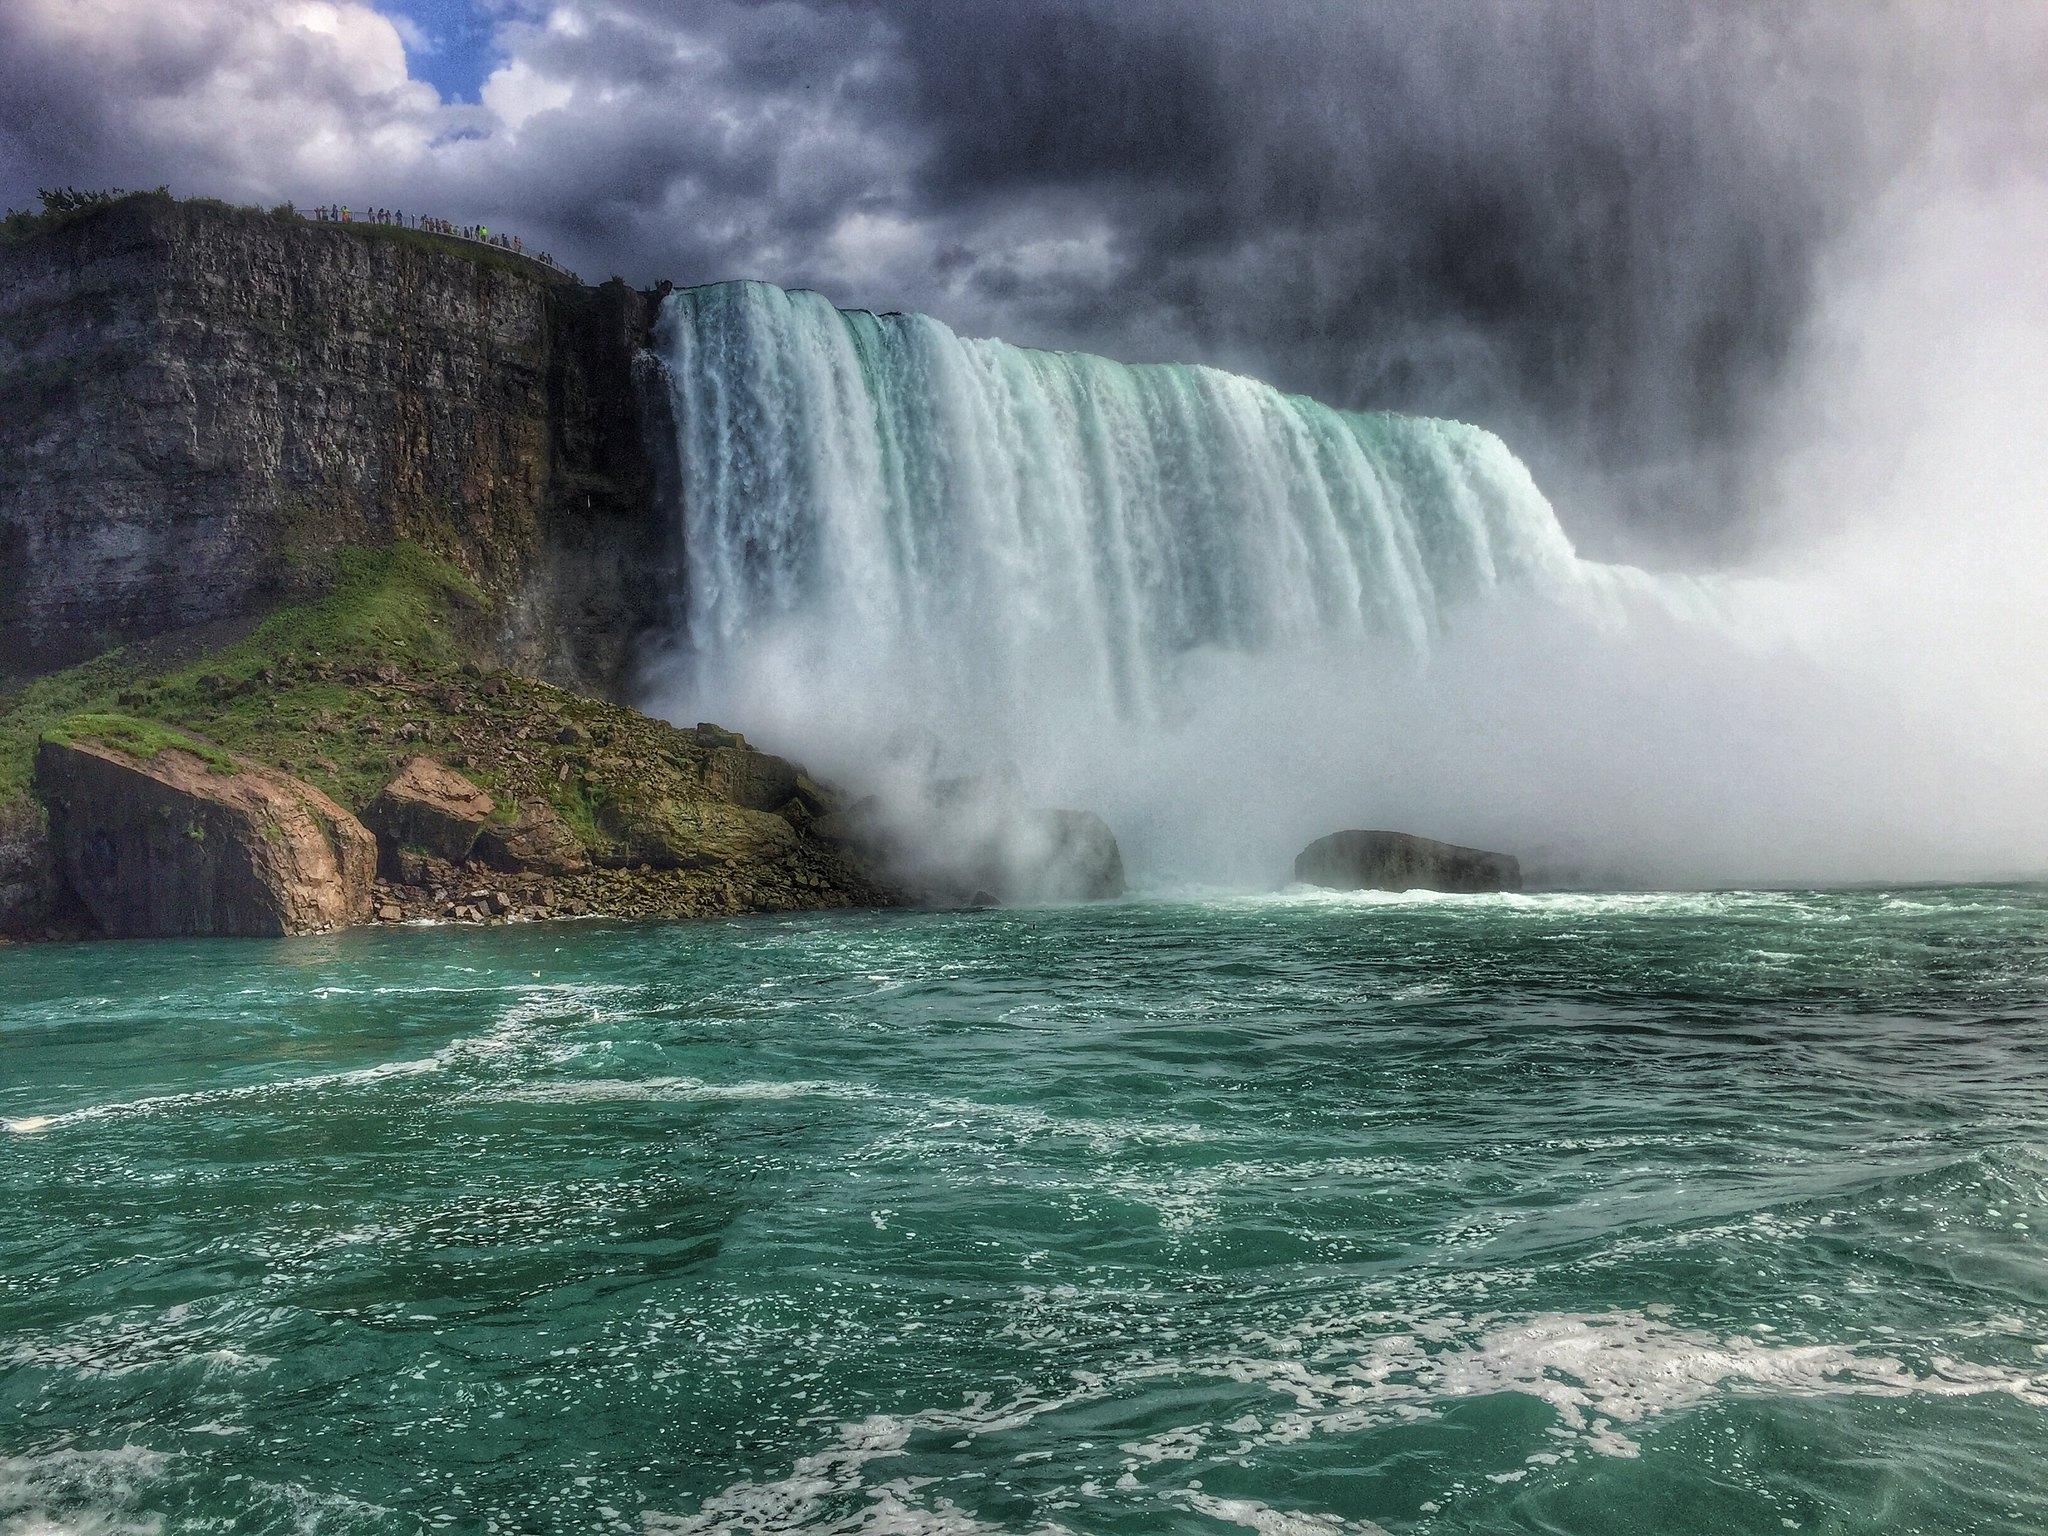 15 Things to do in Niagara Falls, New York